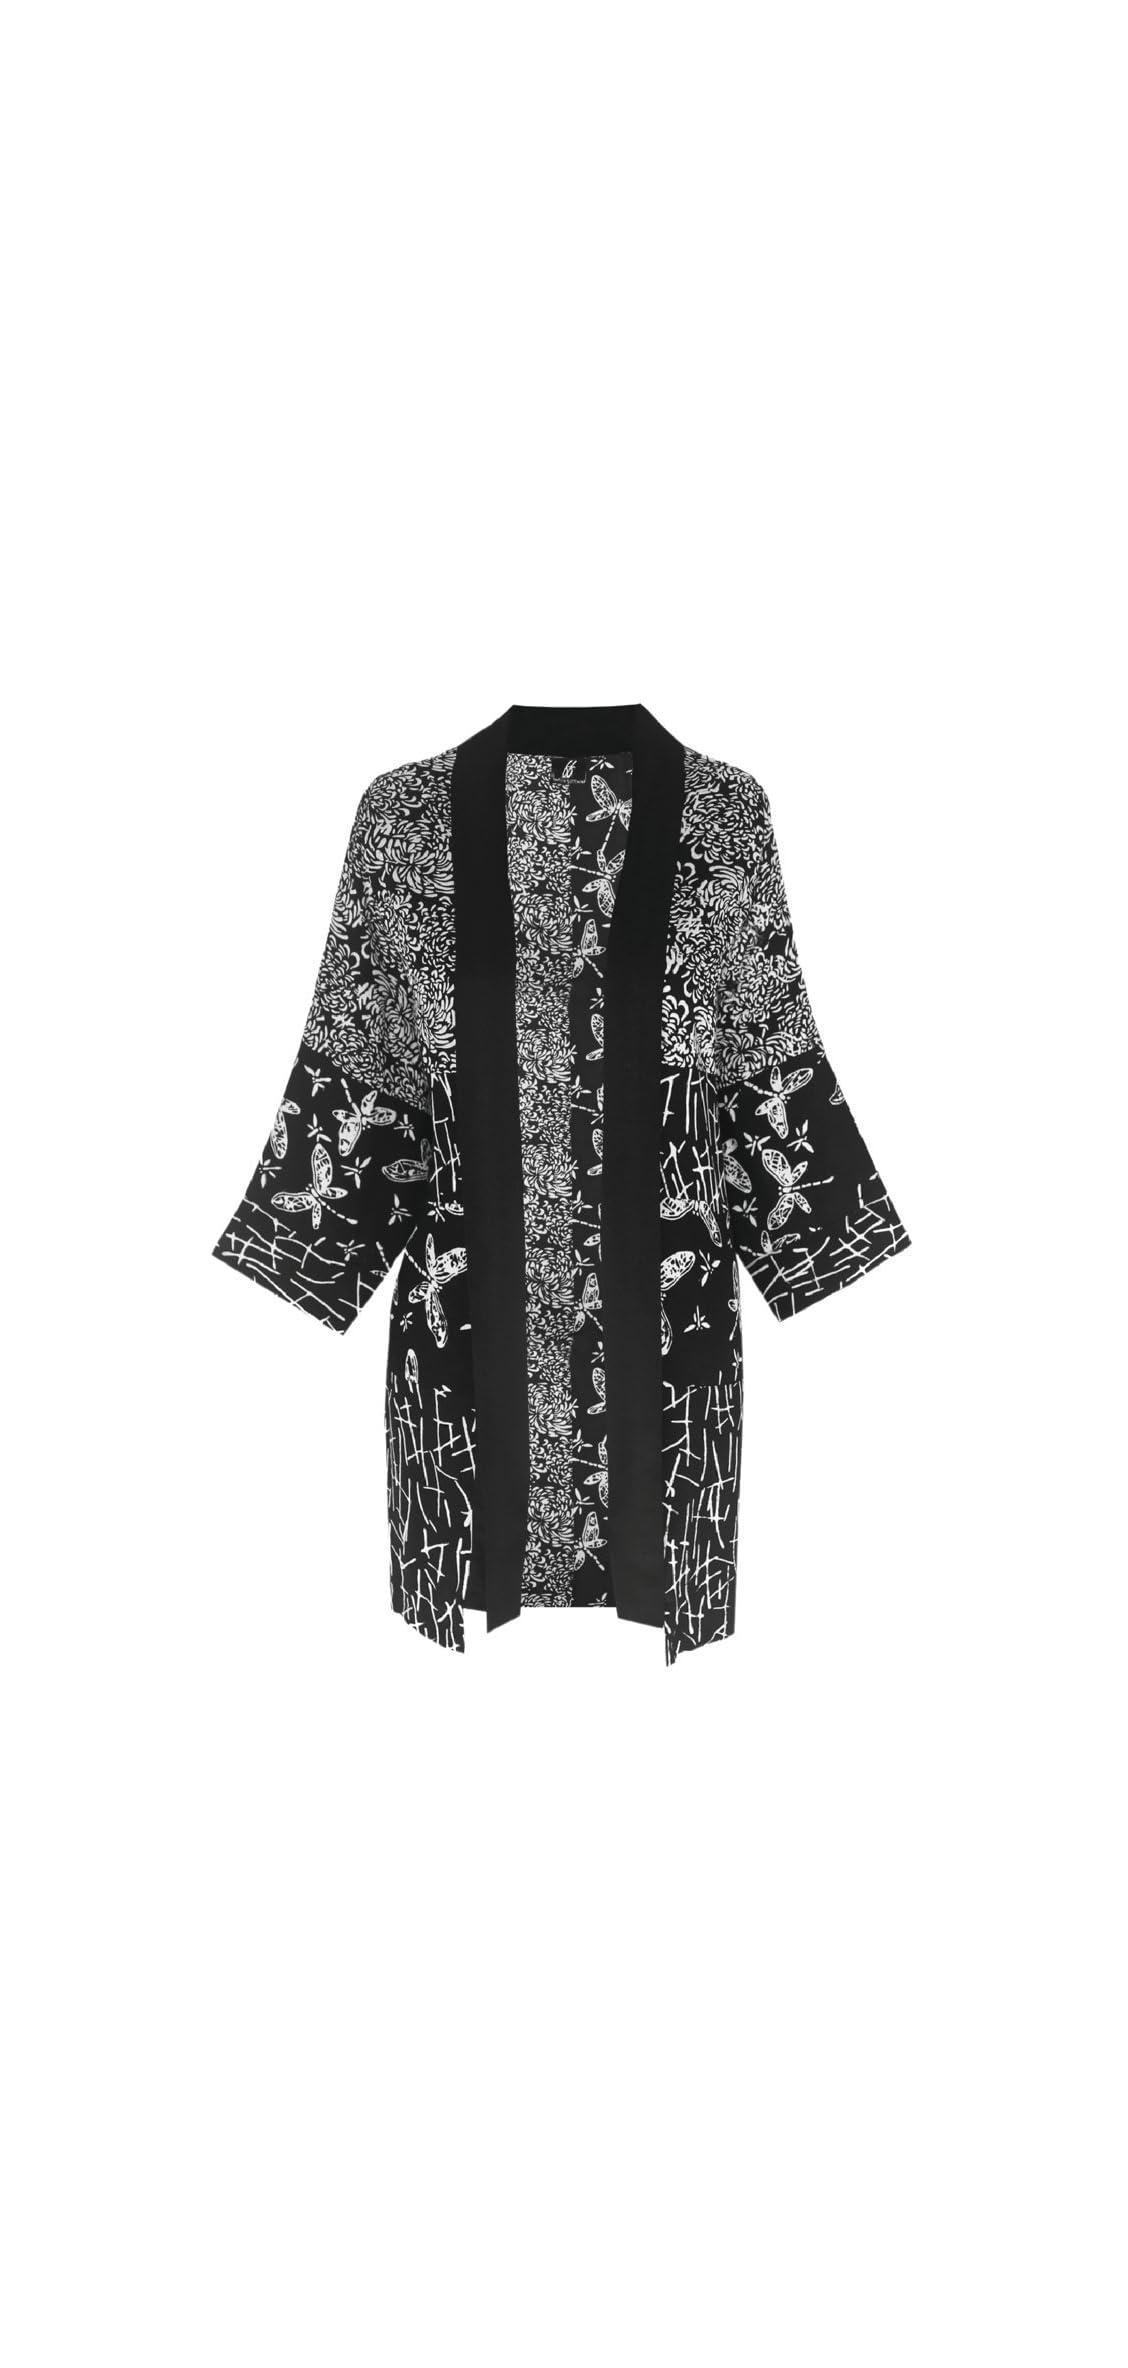 Plus Size Kimono Cardigan  Women's Kimono, Handmade By Stephen